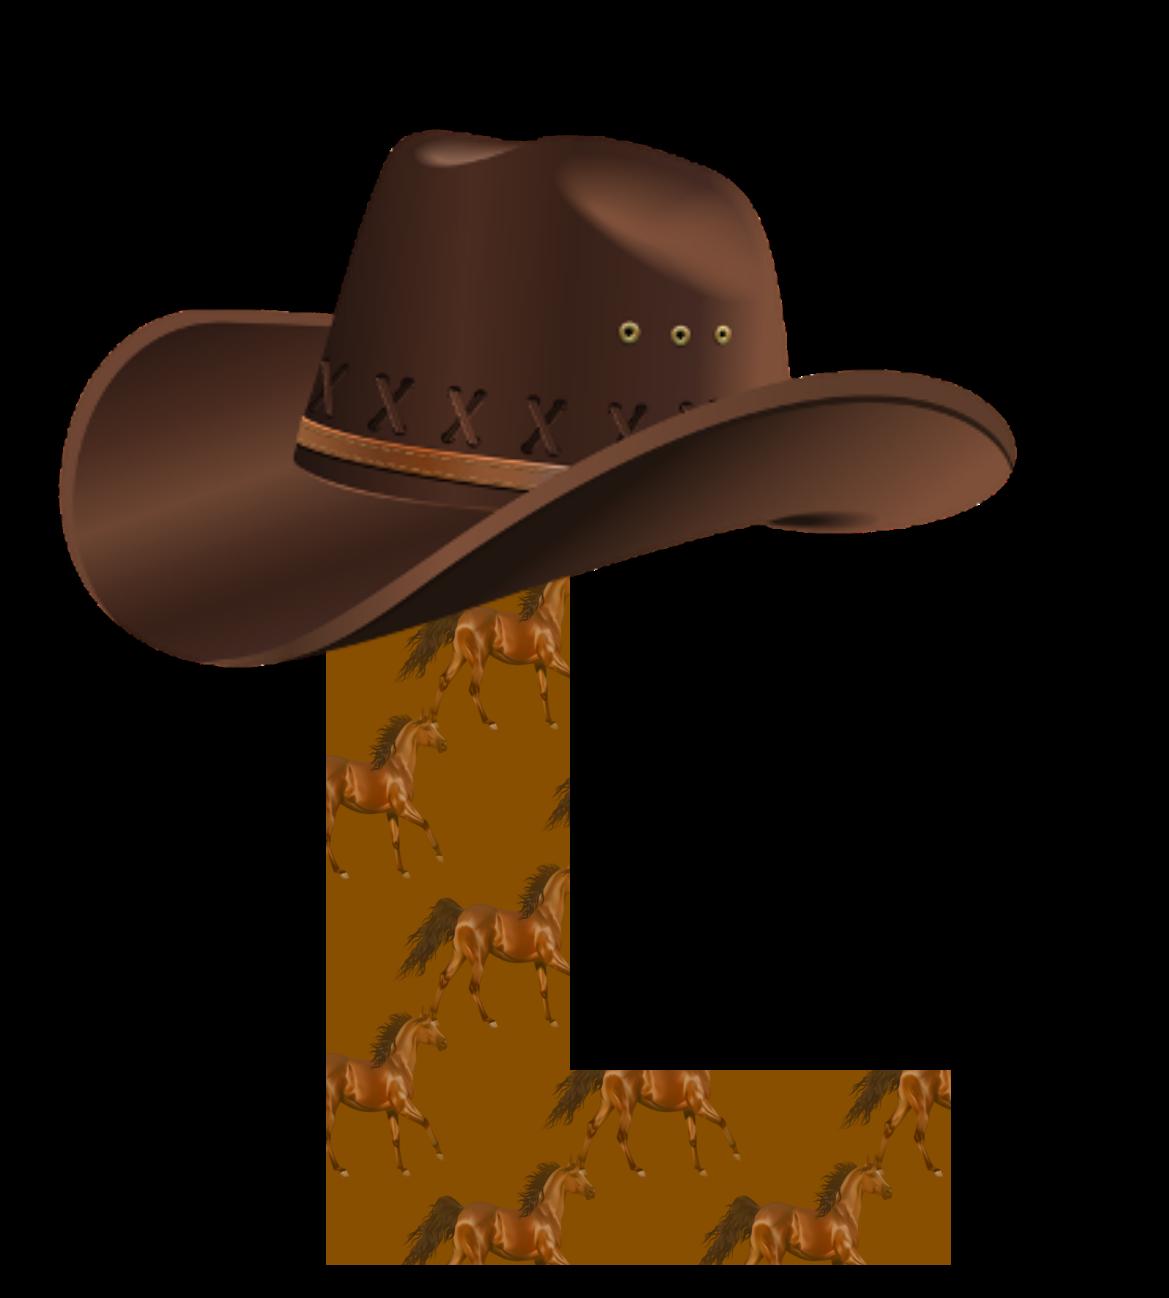 Cowboy Alphabet 039 Png 1169 1298 Alphabet Toy Story Birthday Party Cowboy Party